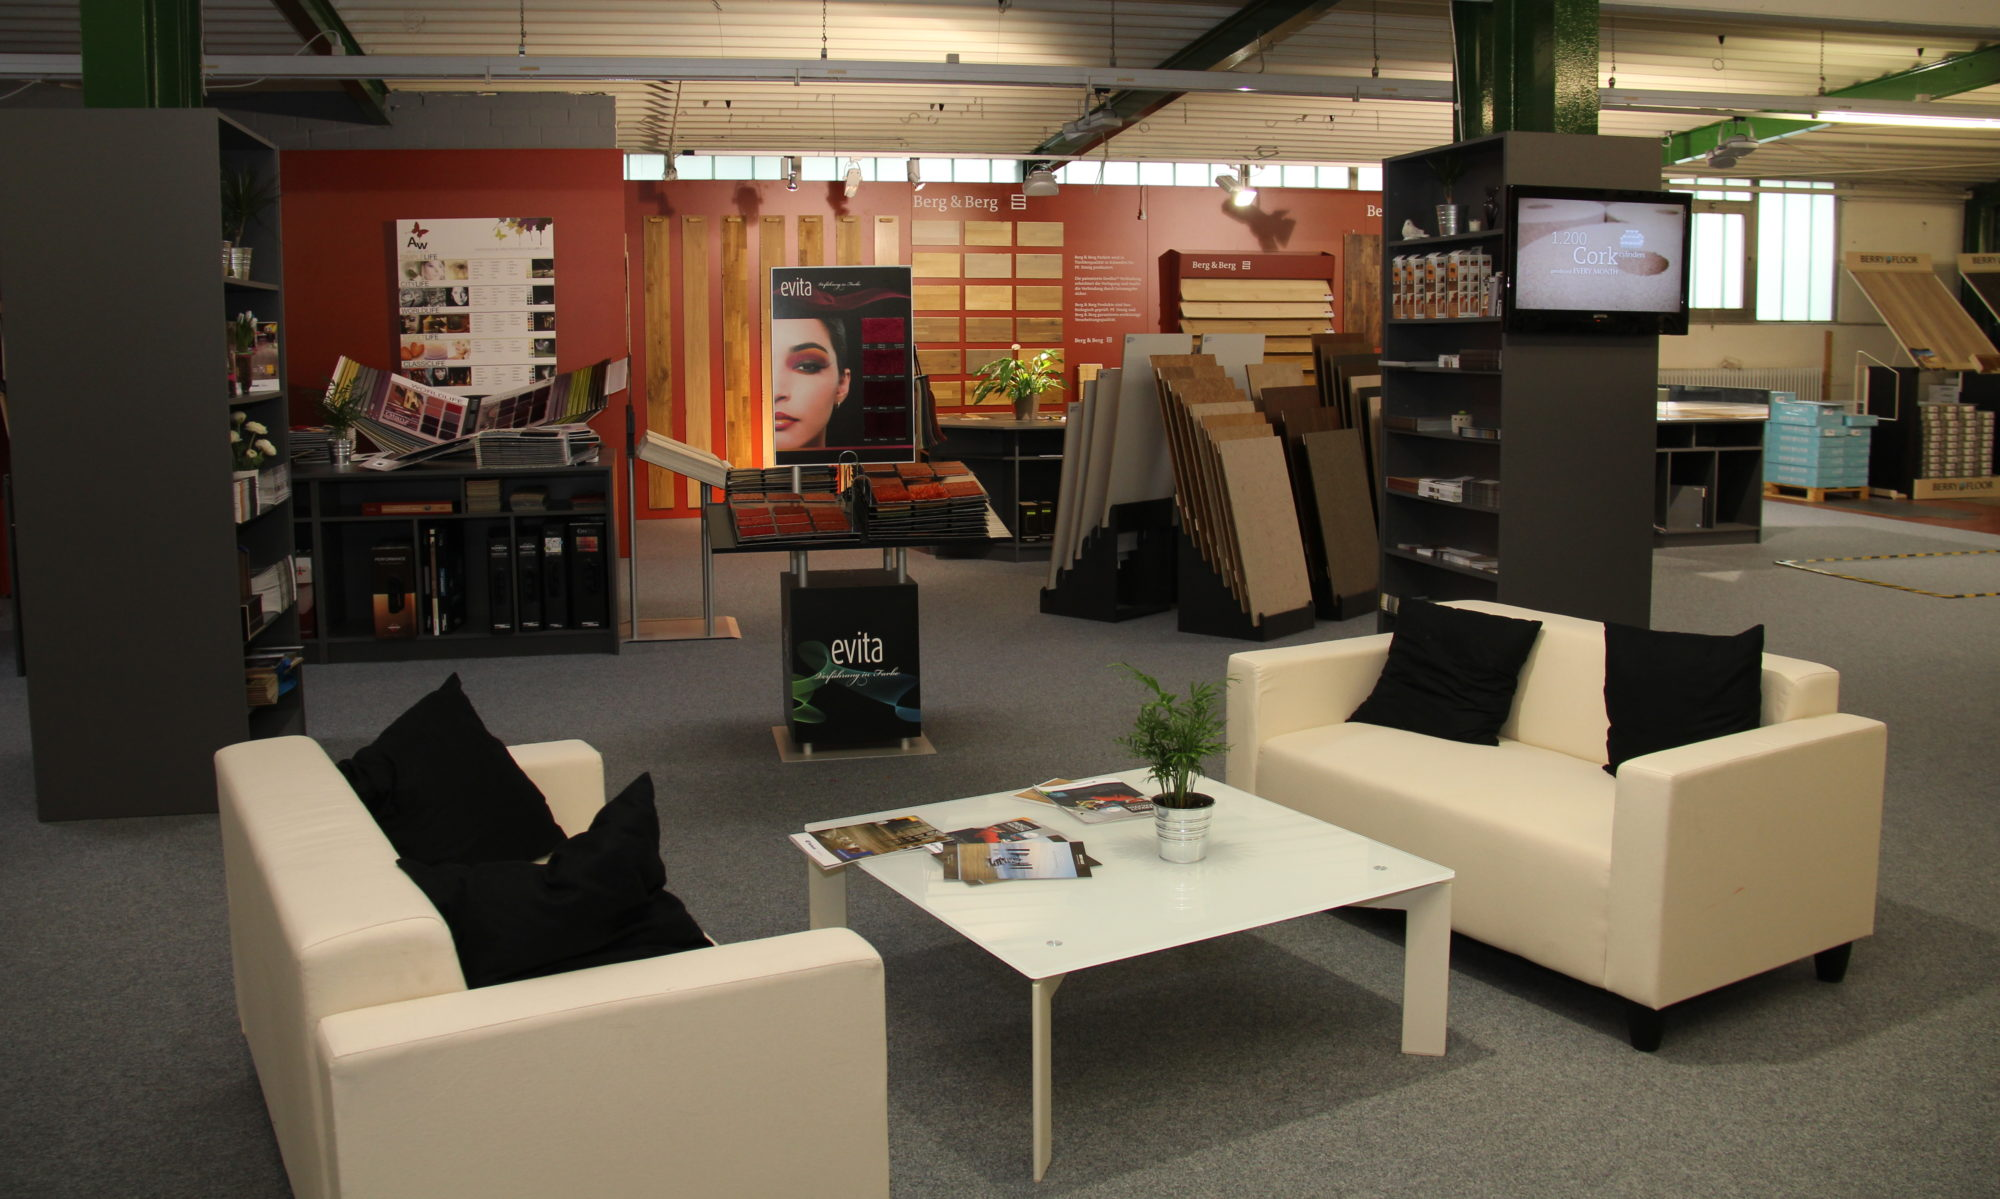 Holz & Ladendesign Velten